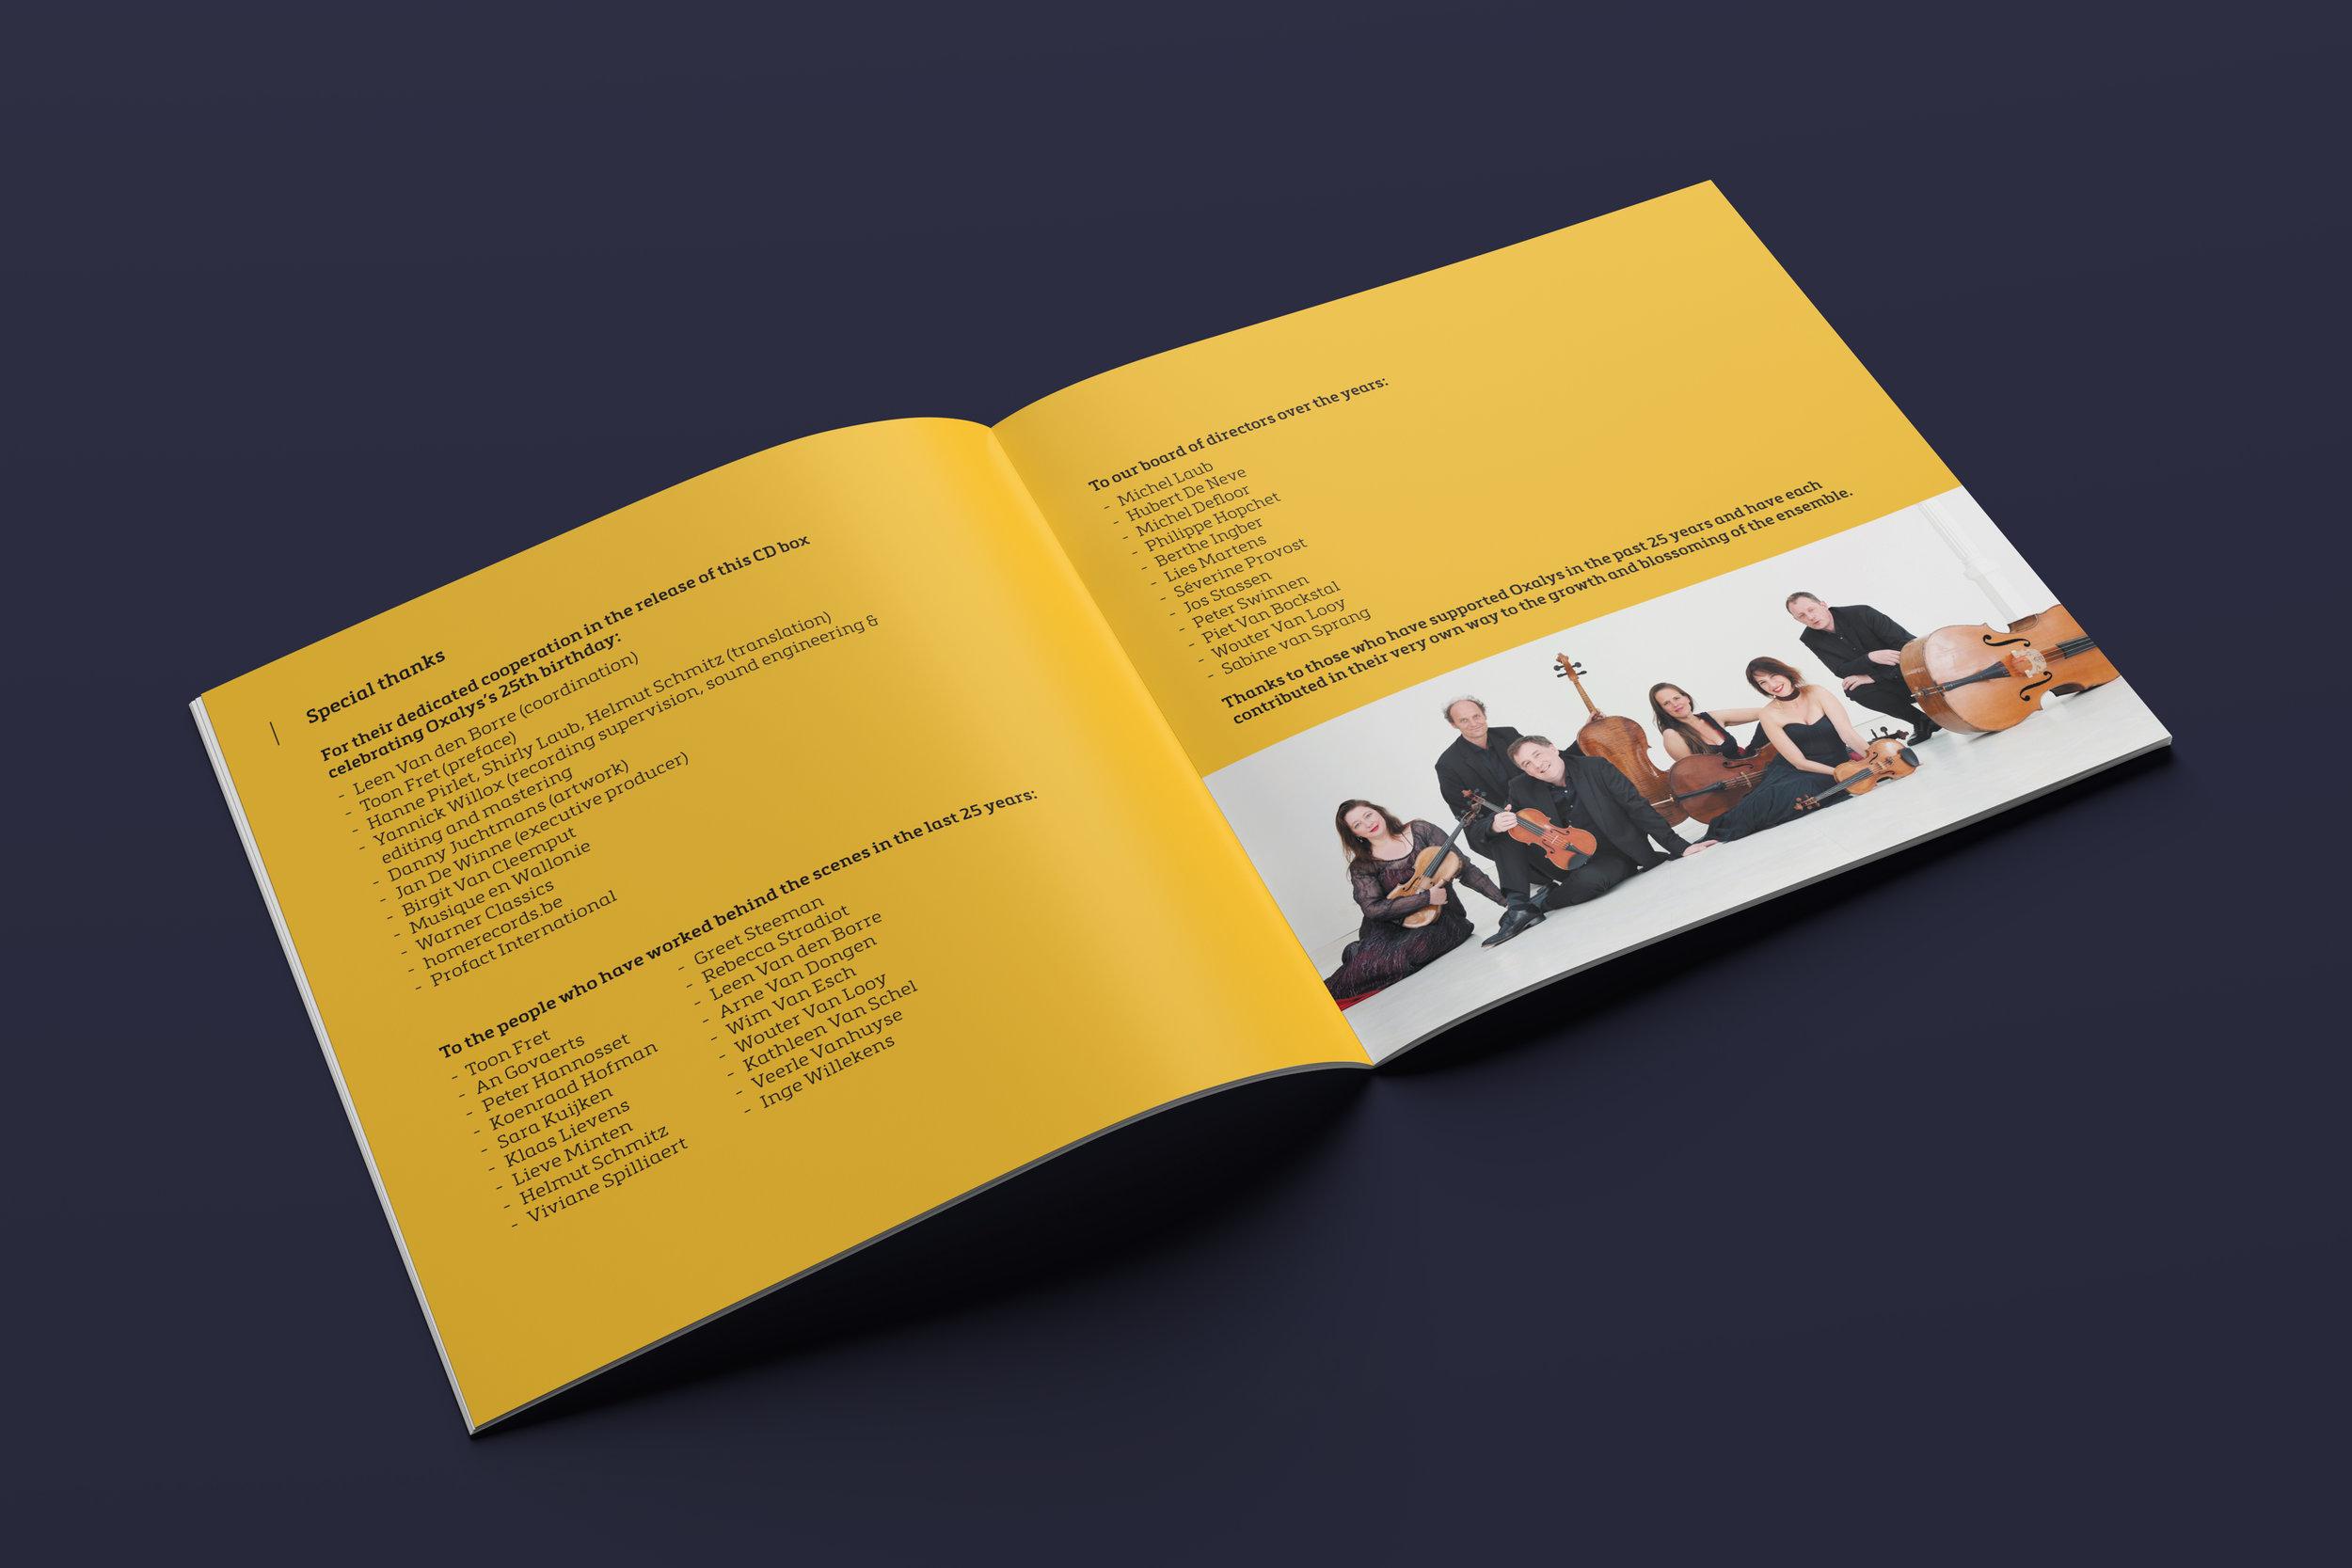 CD-boekje 'Oxalys 25 jaar'